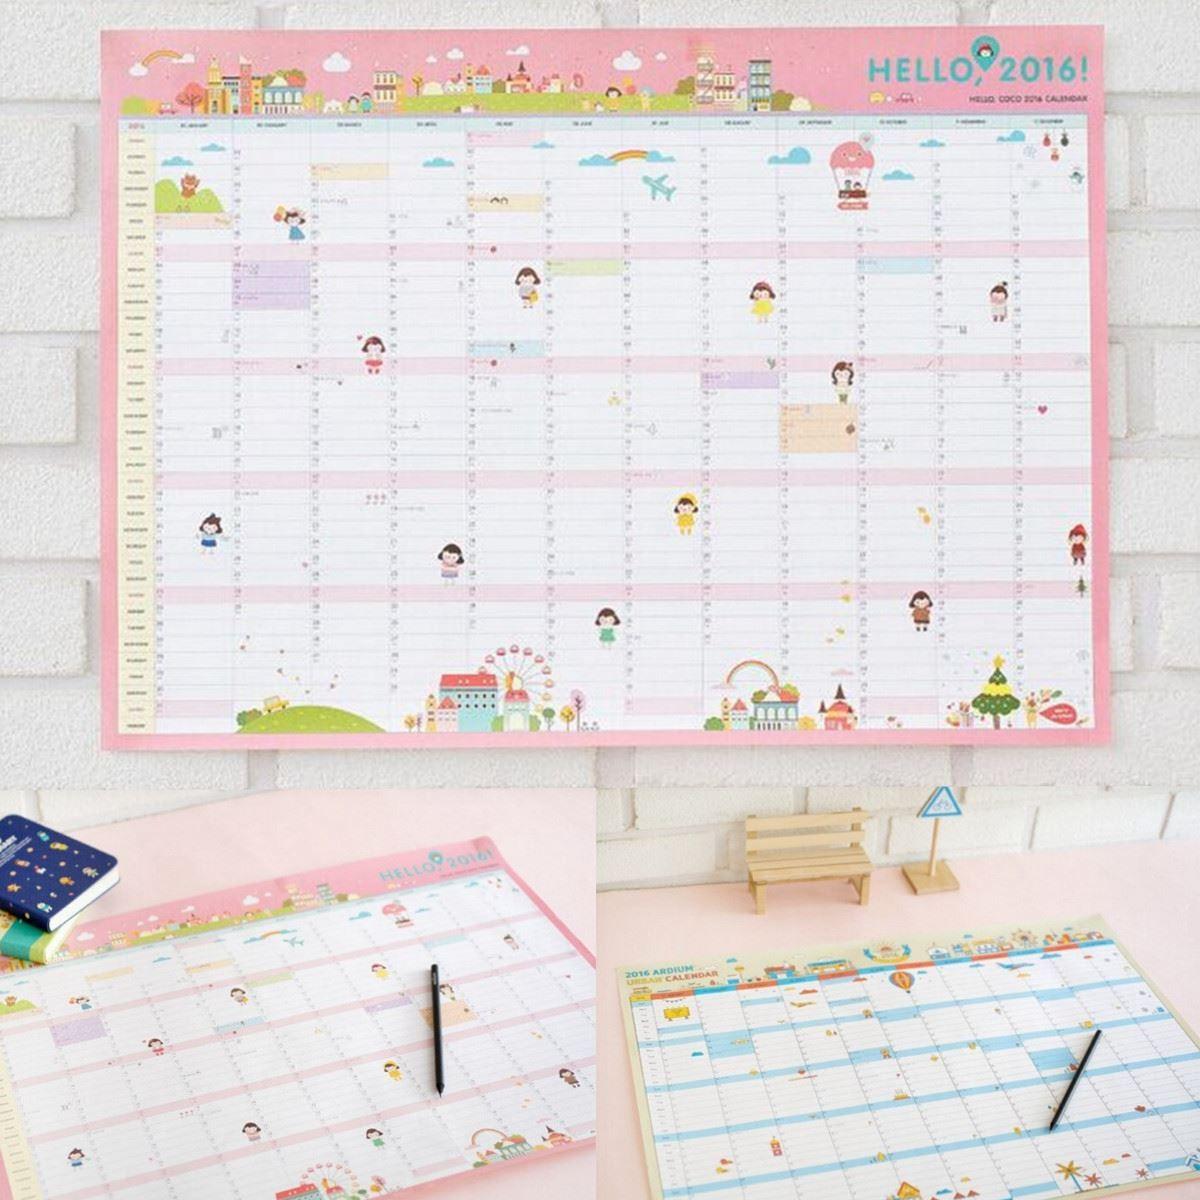 Hanging Planner Calendar : New wall monthly planner calendar paper work study